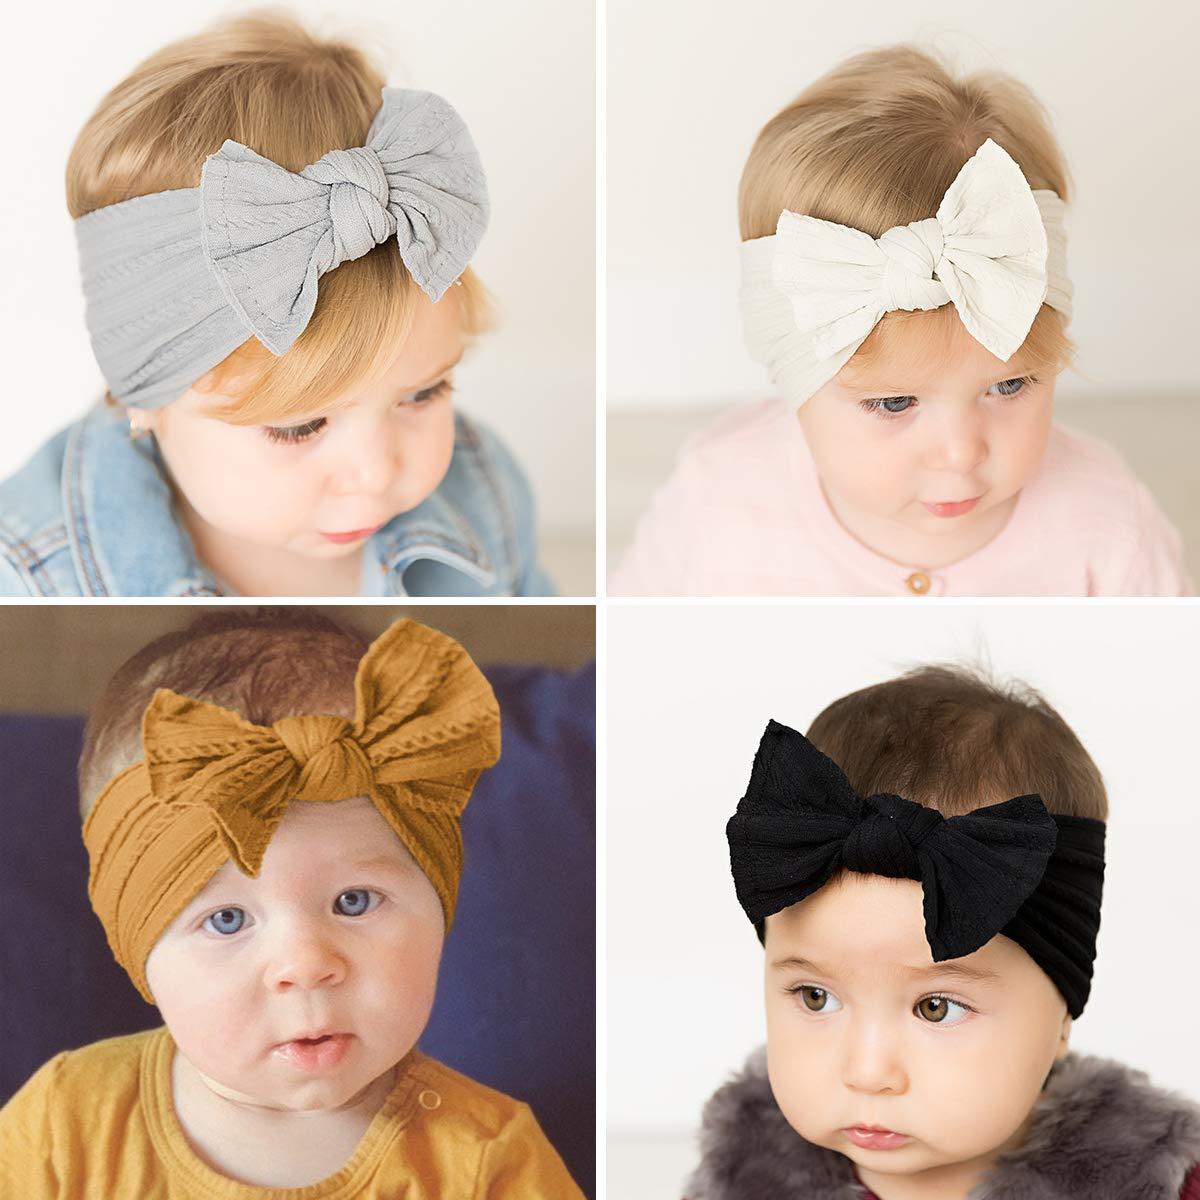 Makone Handmade Baby Headbands with Big Hair Bows Stretchy Headbands for Infant Baby Girls